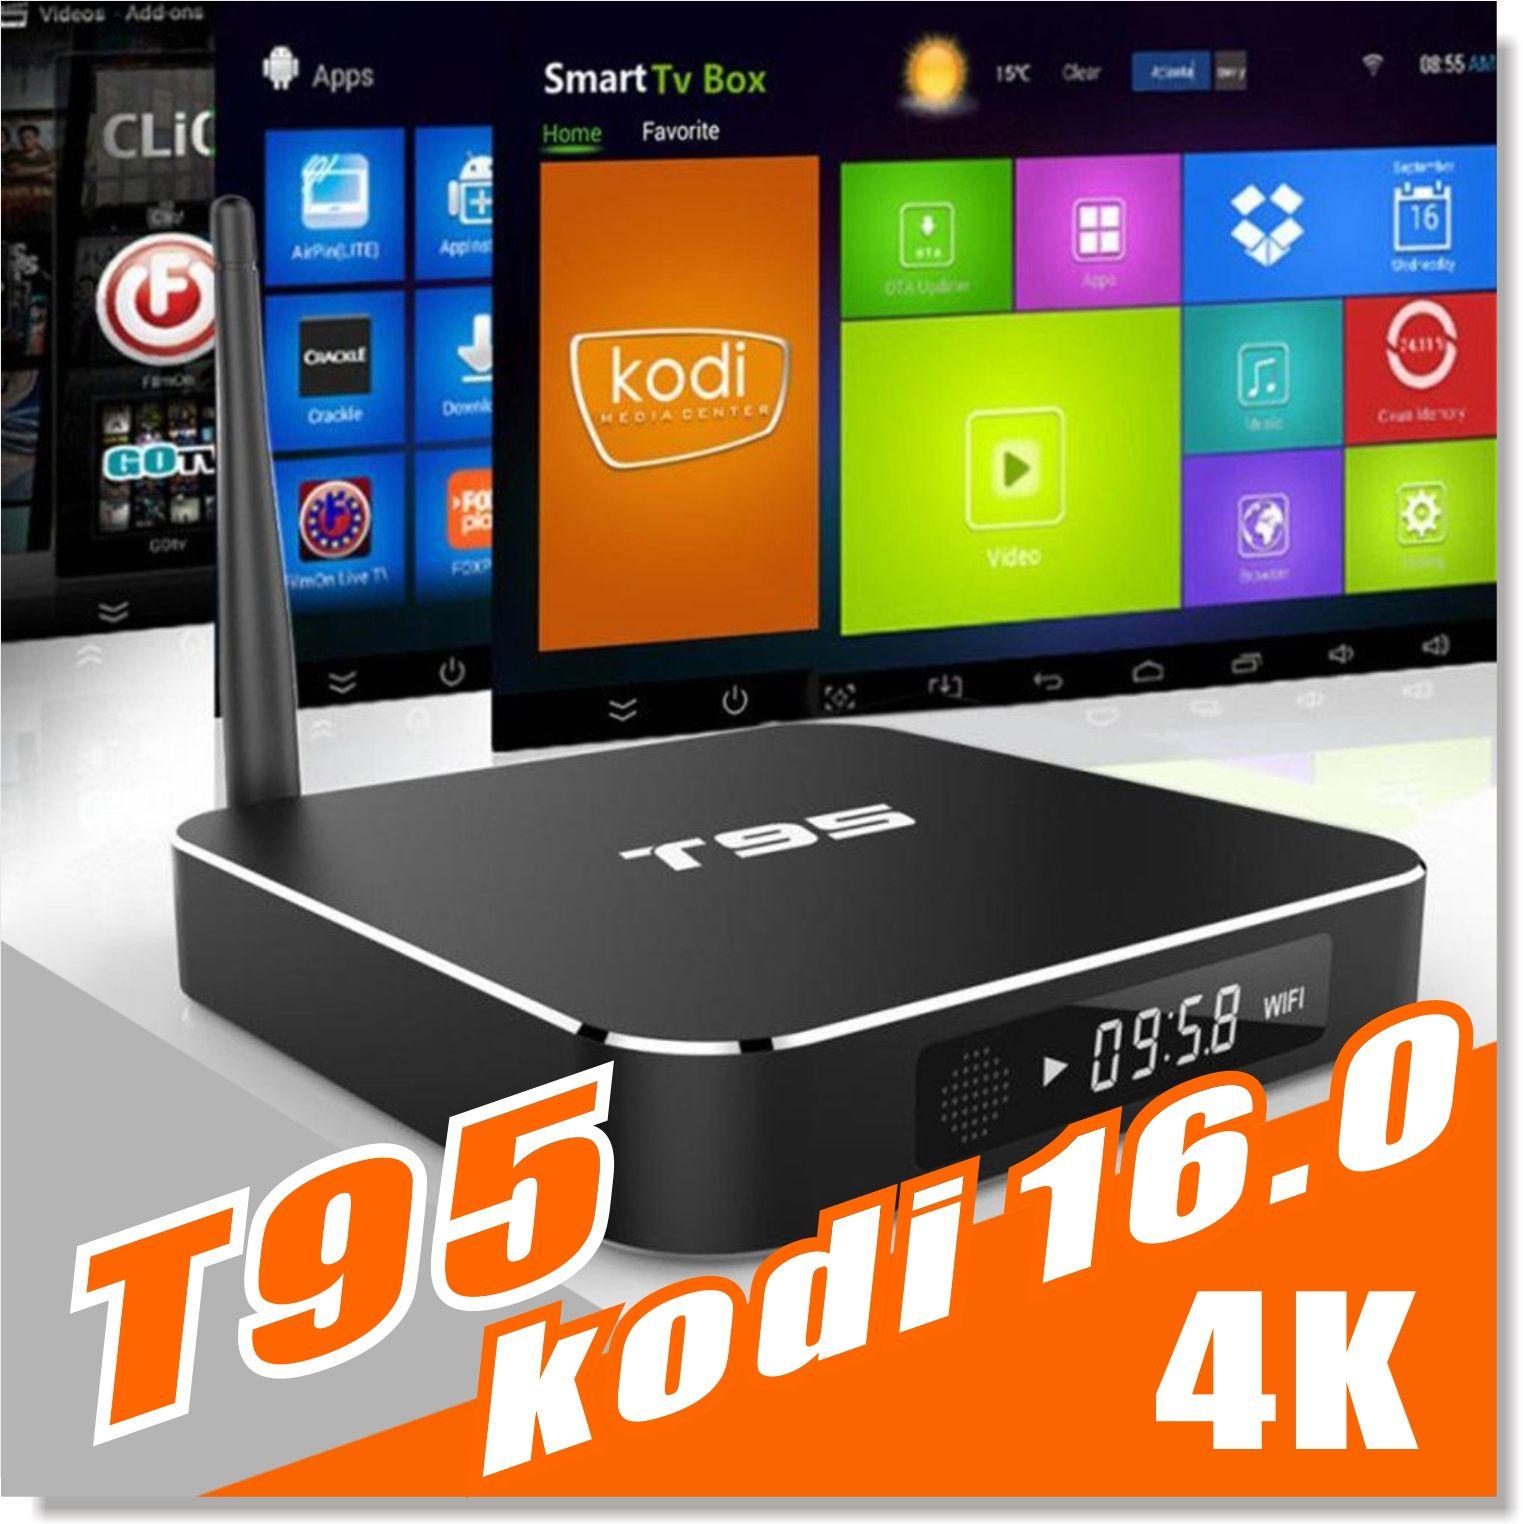 T95 Android Tv Box Amlogic S905 Quad Core 16 1 Fully